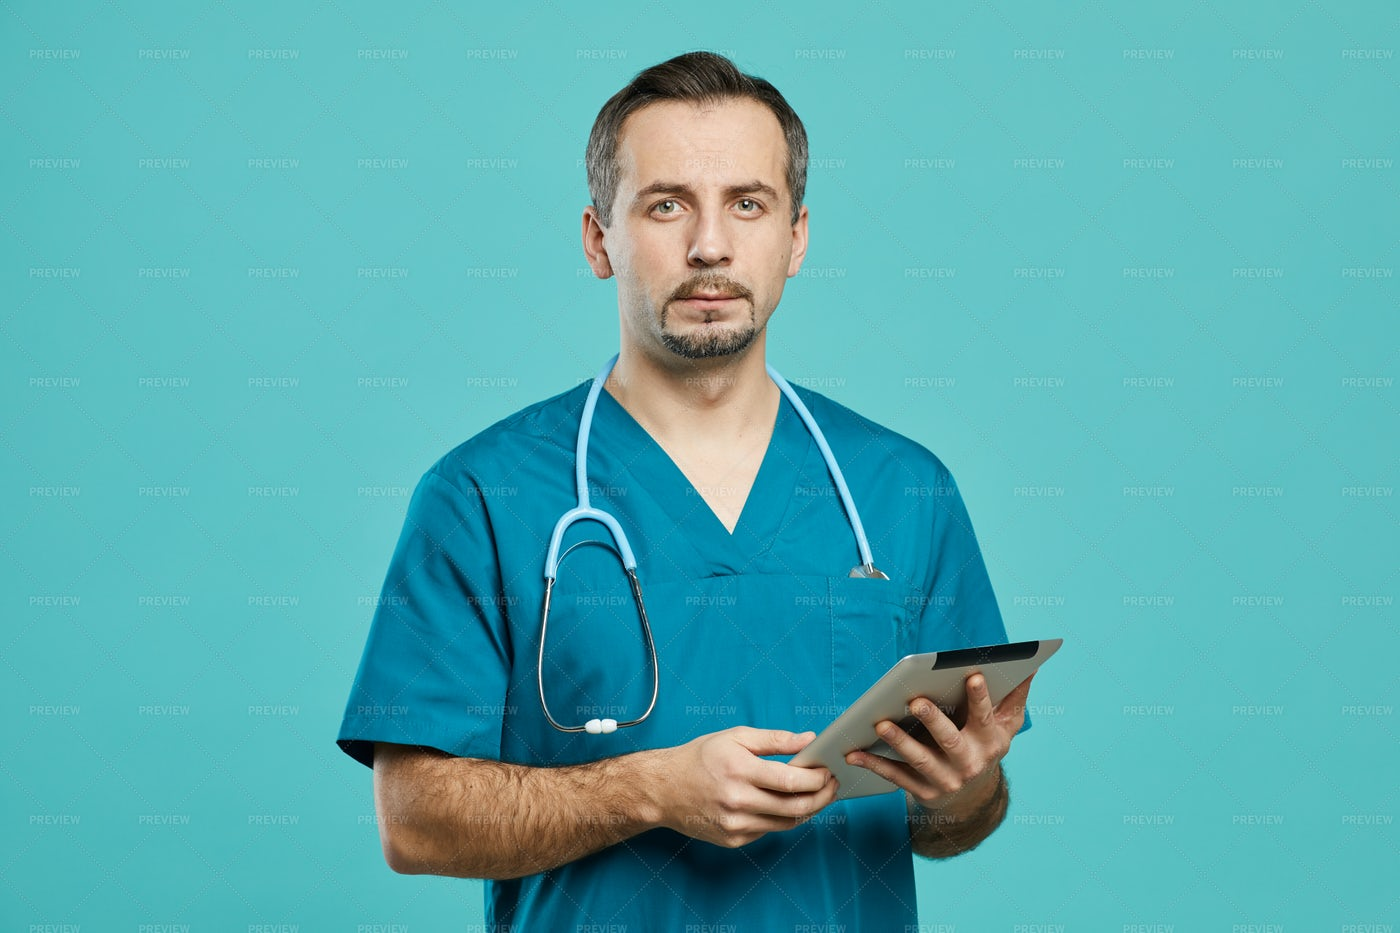 Surgeon With Tablet Portrait: Stock Photos